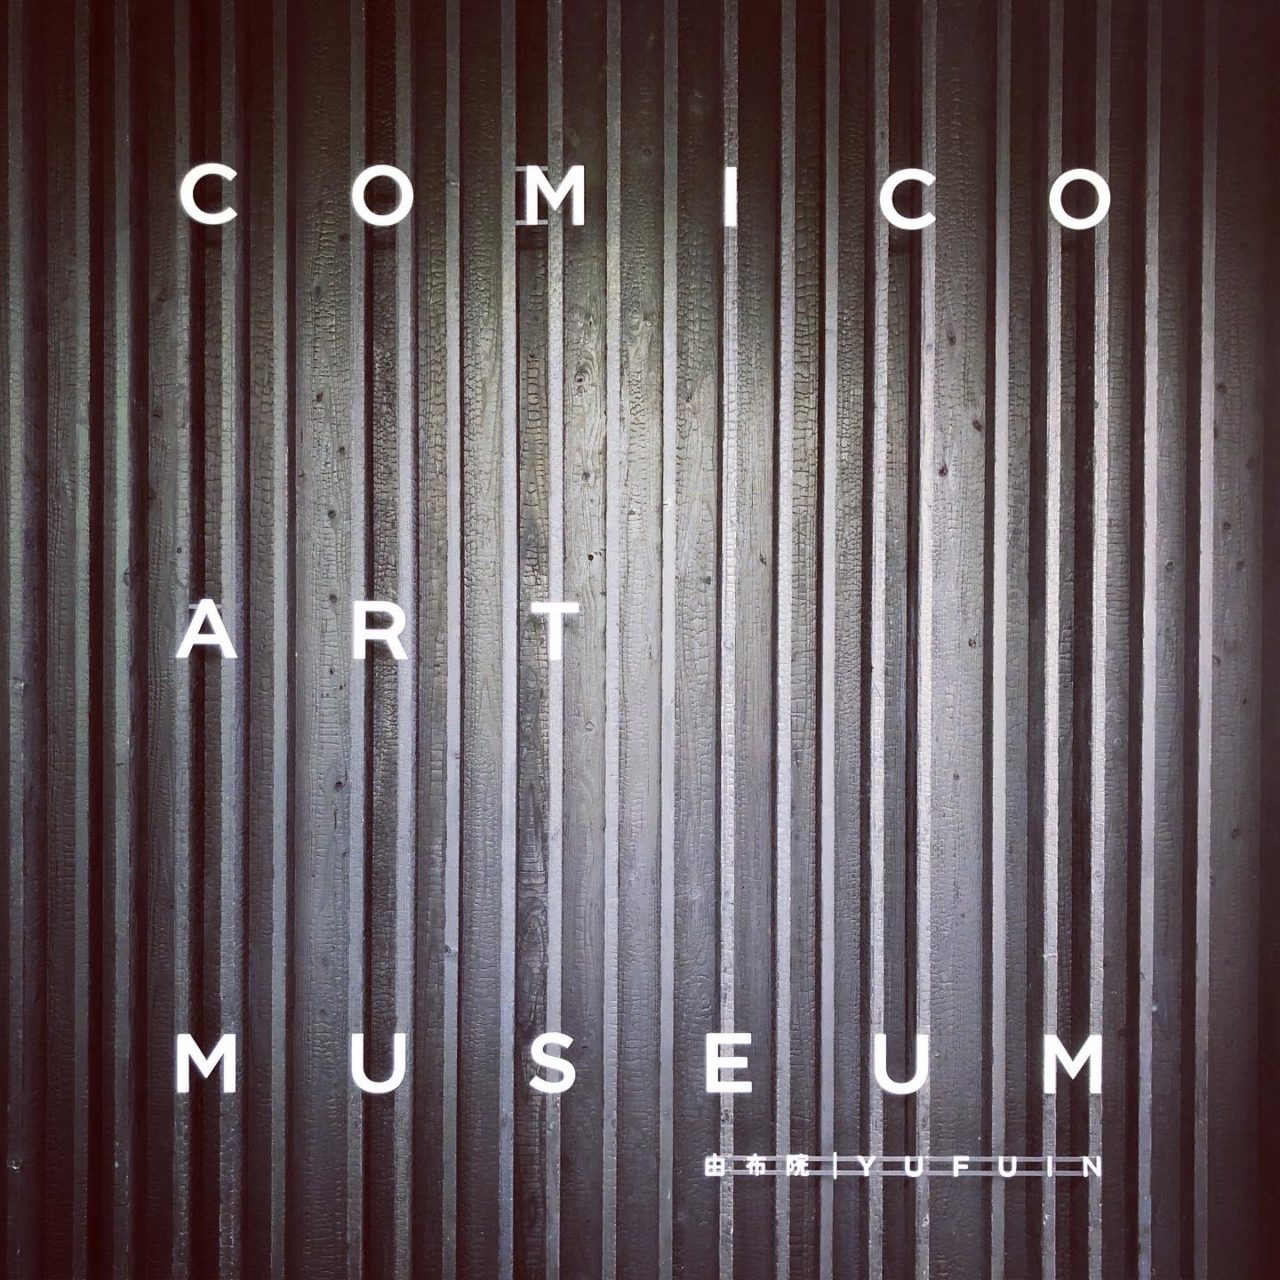 COMICO ART MUSEUM 湯布院にある完全予約制の美術館